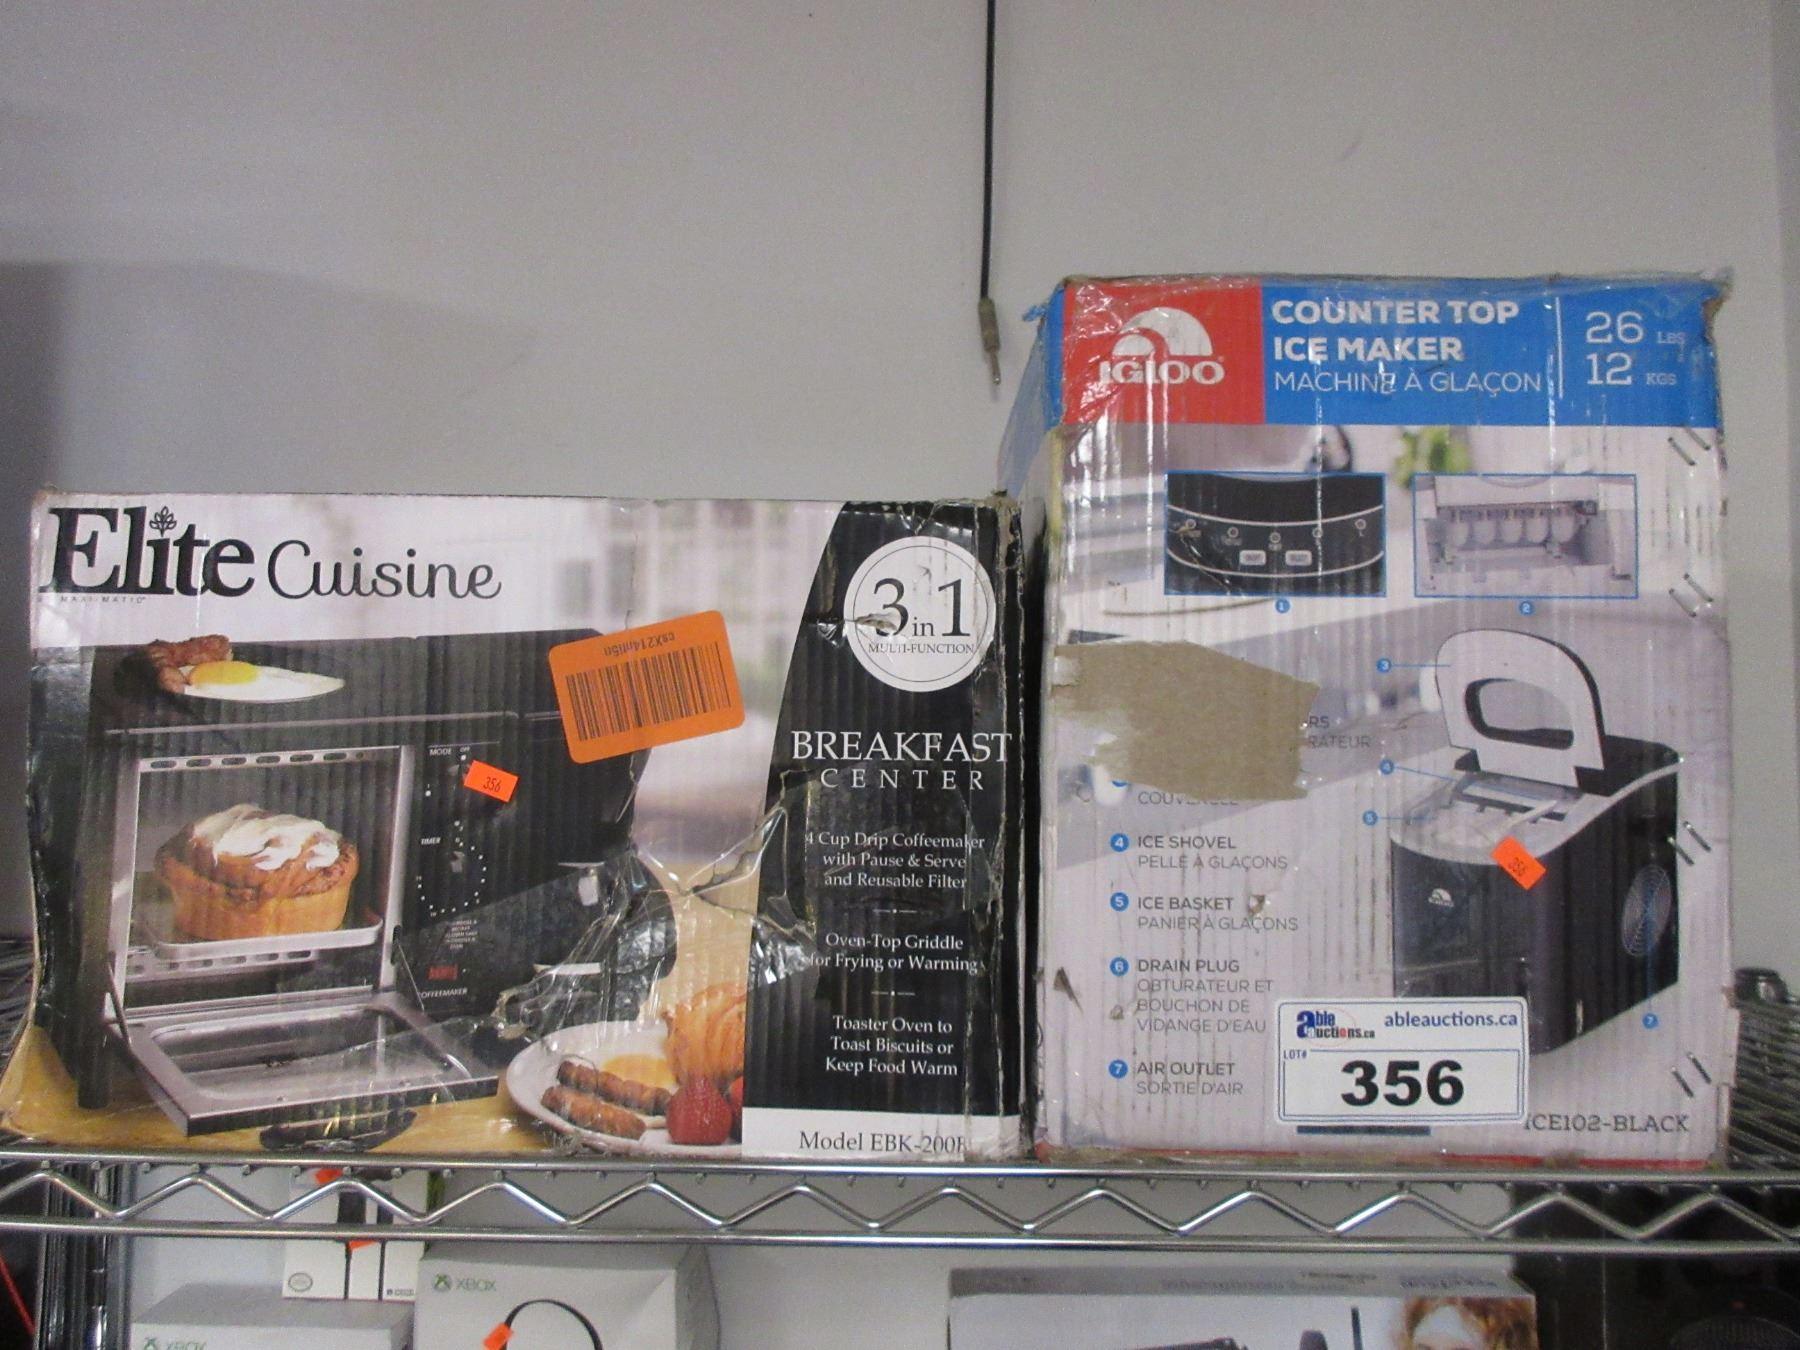 Elite Cuisine Breakfast Center Igloo Counter Top Portable Ice Maker